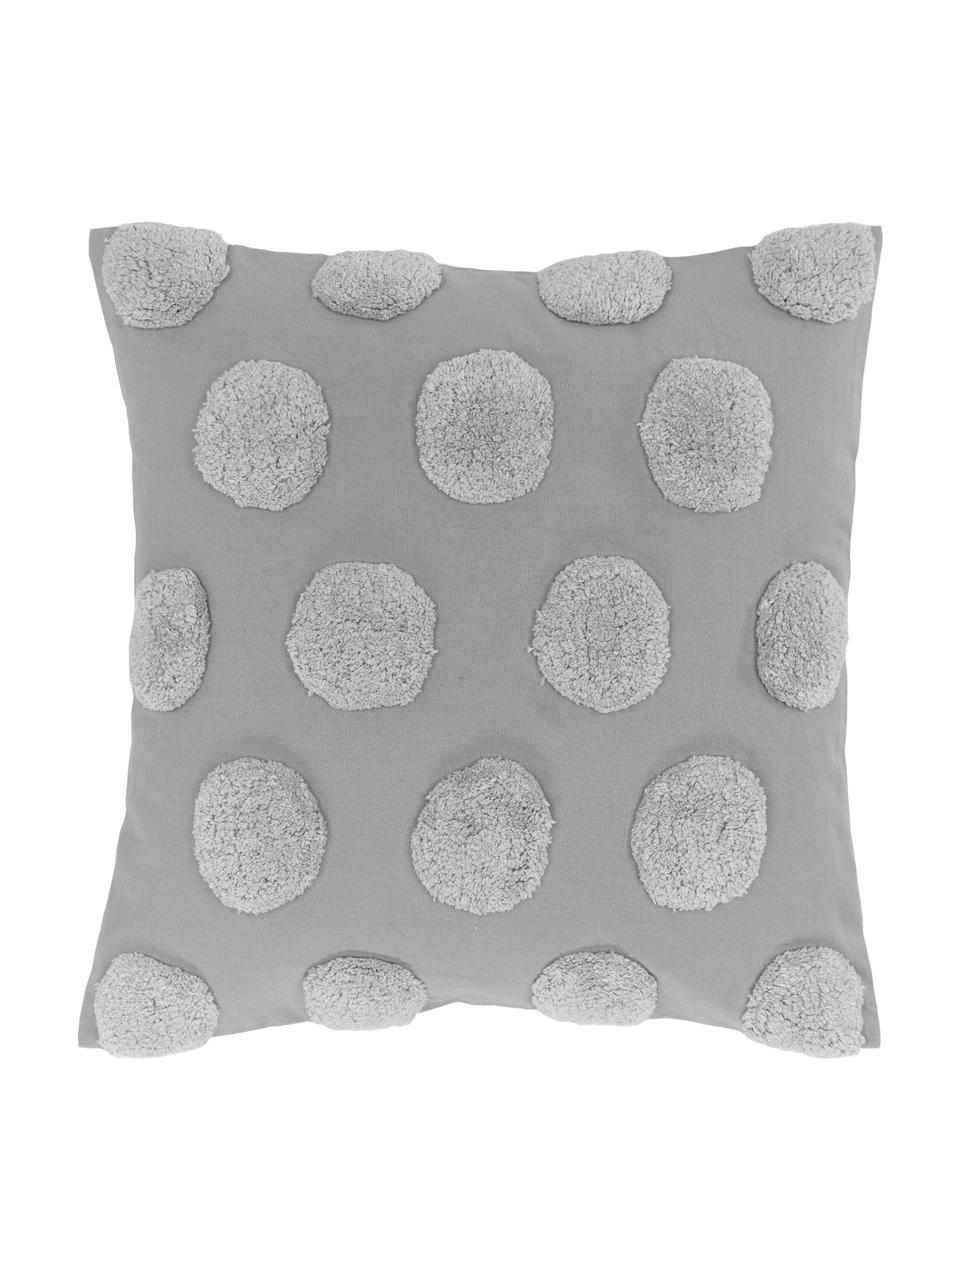 Kissenhülle Rowen mit getuftetem Muster, 100% Baumwolle, Grau, 50 x 50 cm